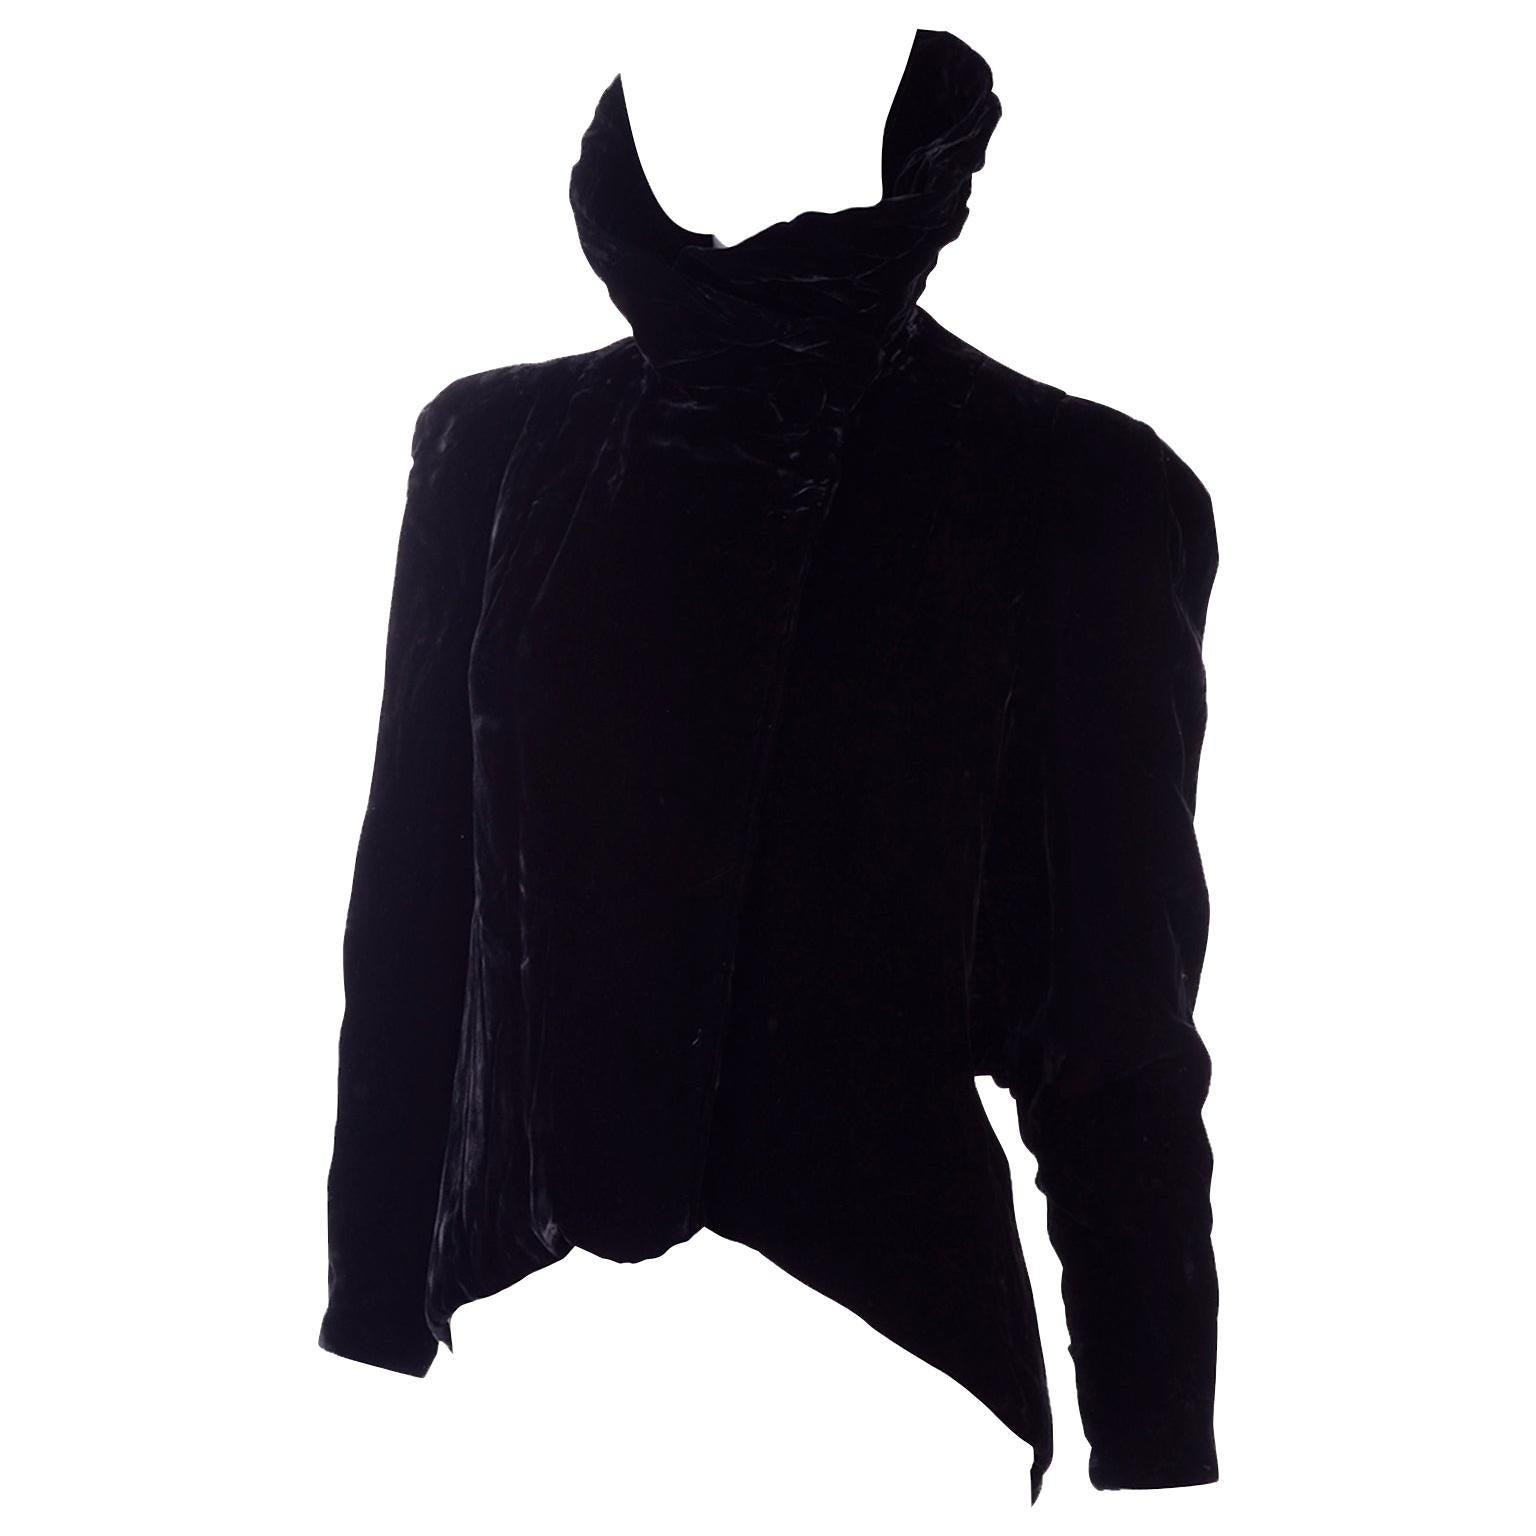 1940s Black Velvet Vintage Evening Jacket W Swing Back & Gathered Puff Sleeves